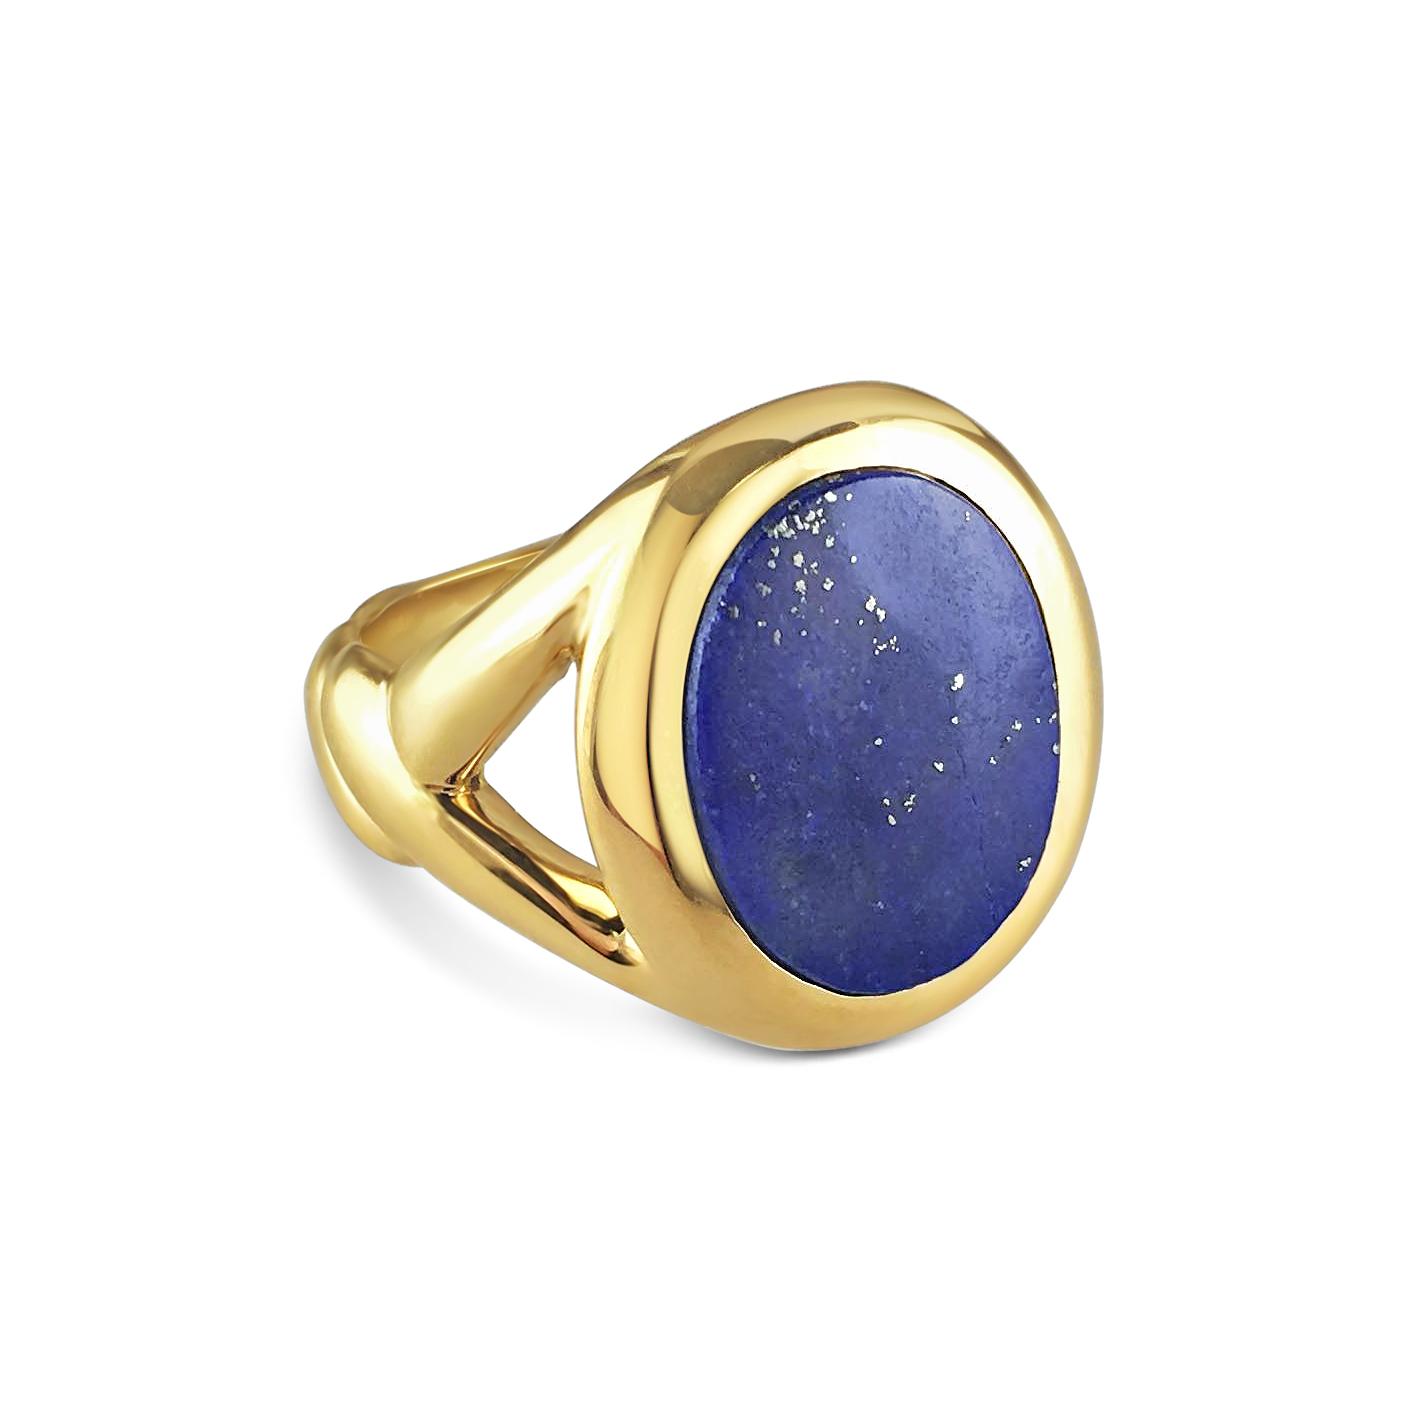 18ct-yellow-gold-and-lapis-signet-ring-1.jpg